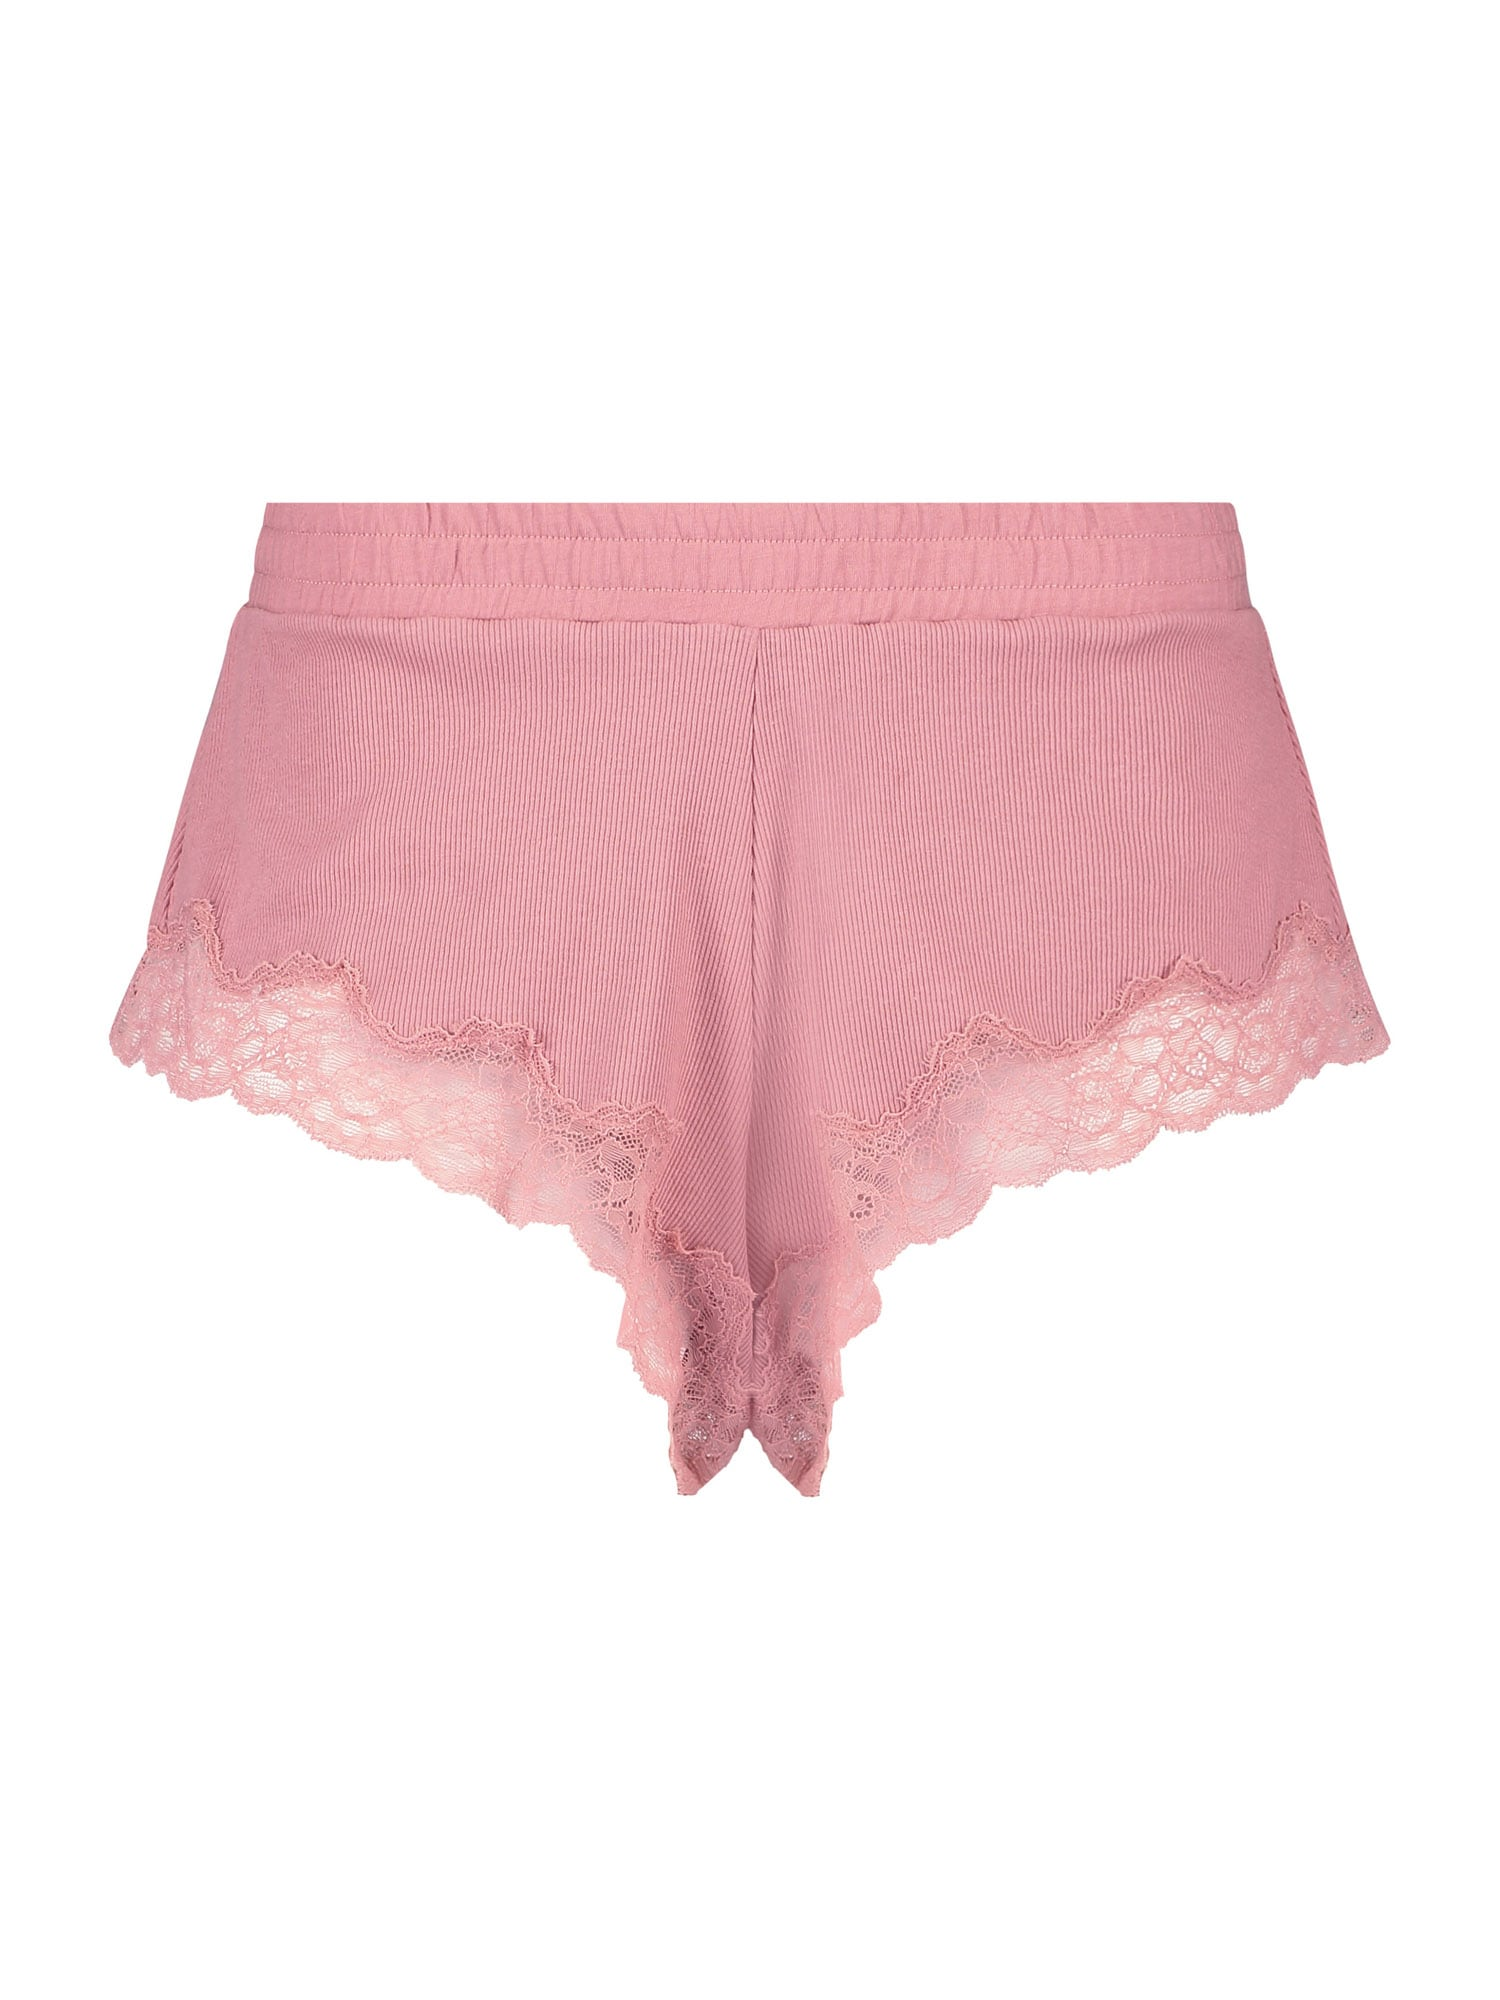 hunkemöller x NA-KD Pižaminės kelnės